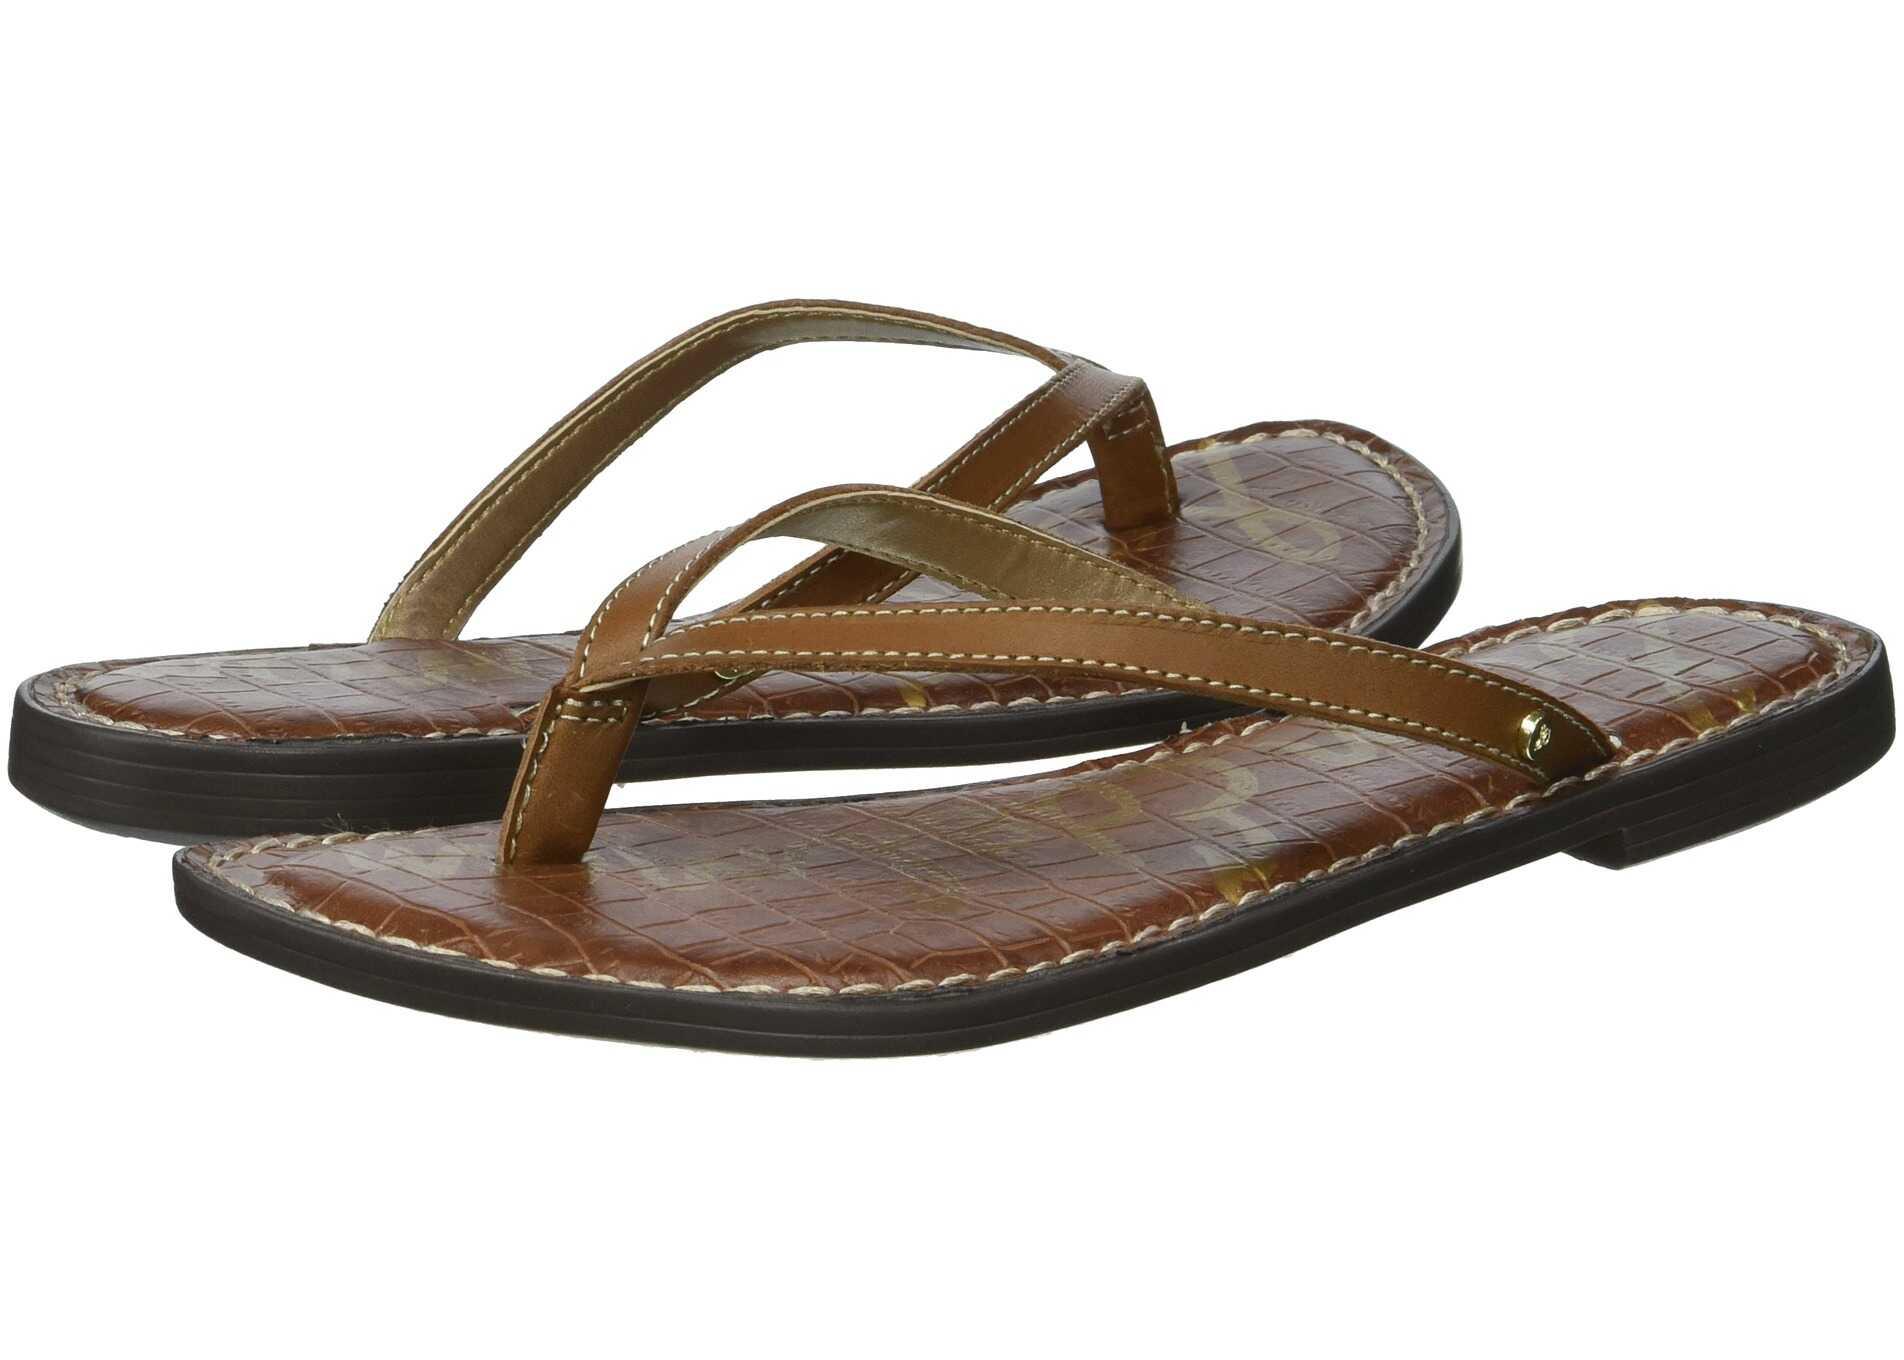 Sam Edelman Gracie Luggage Vaquero Saddle Leather